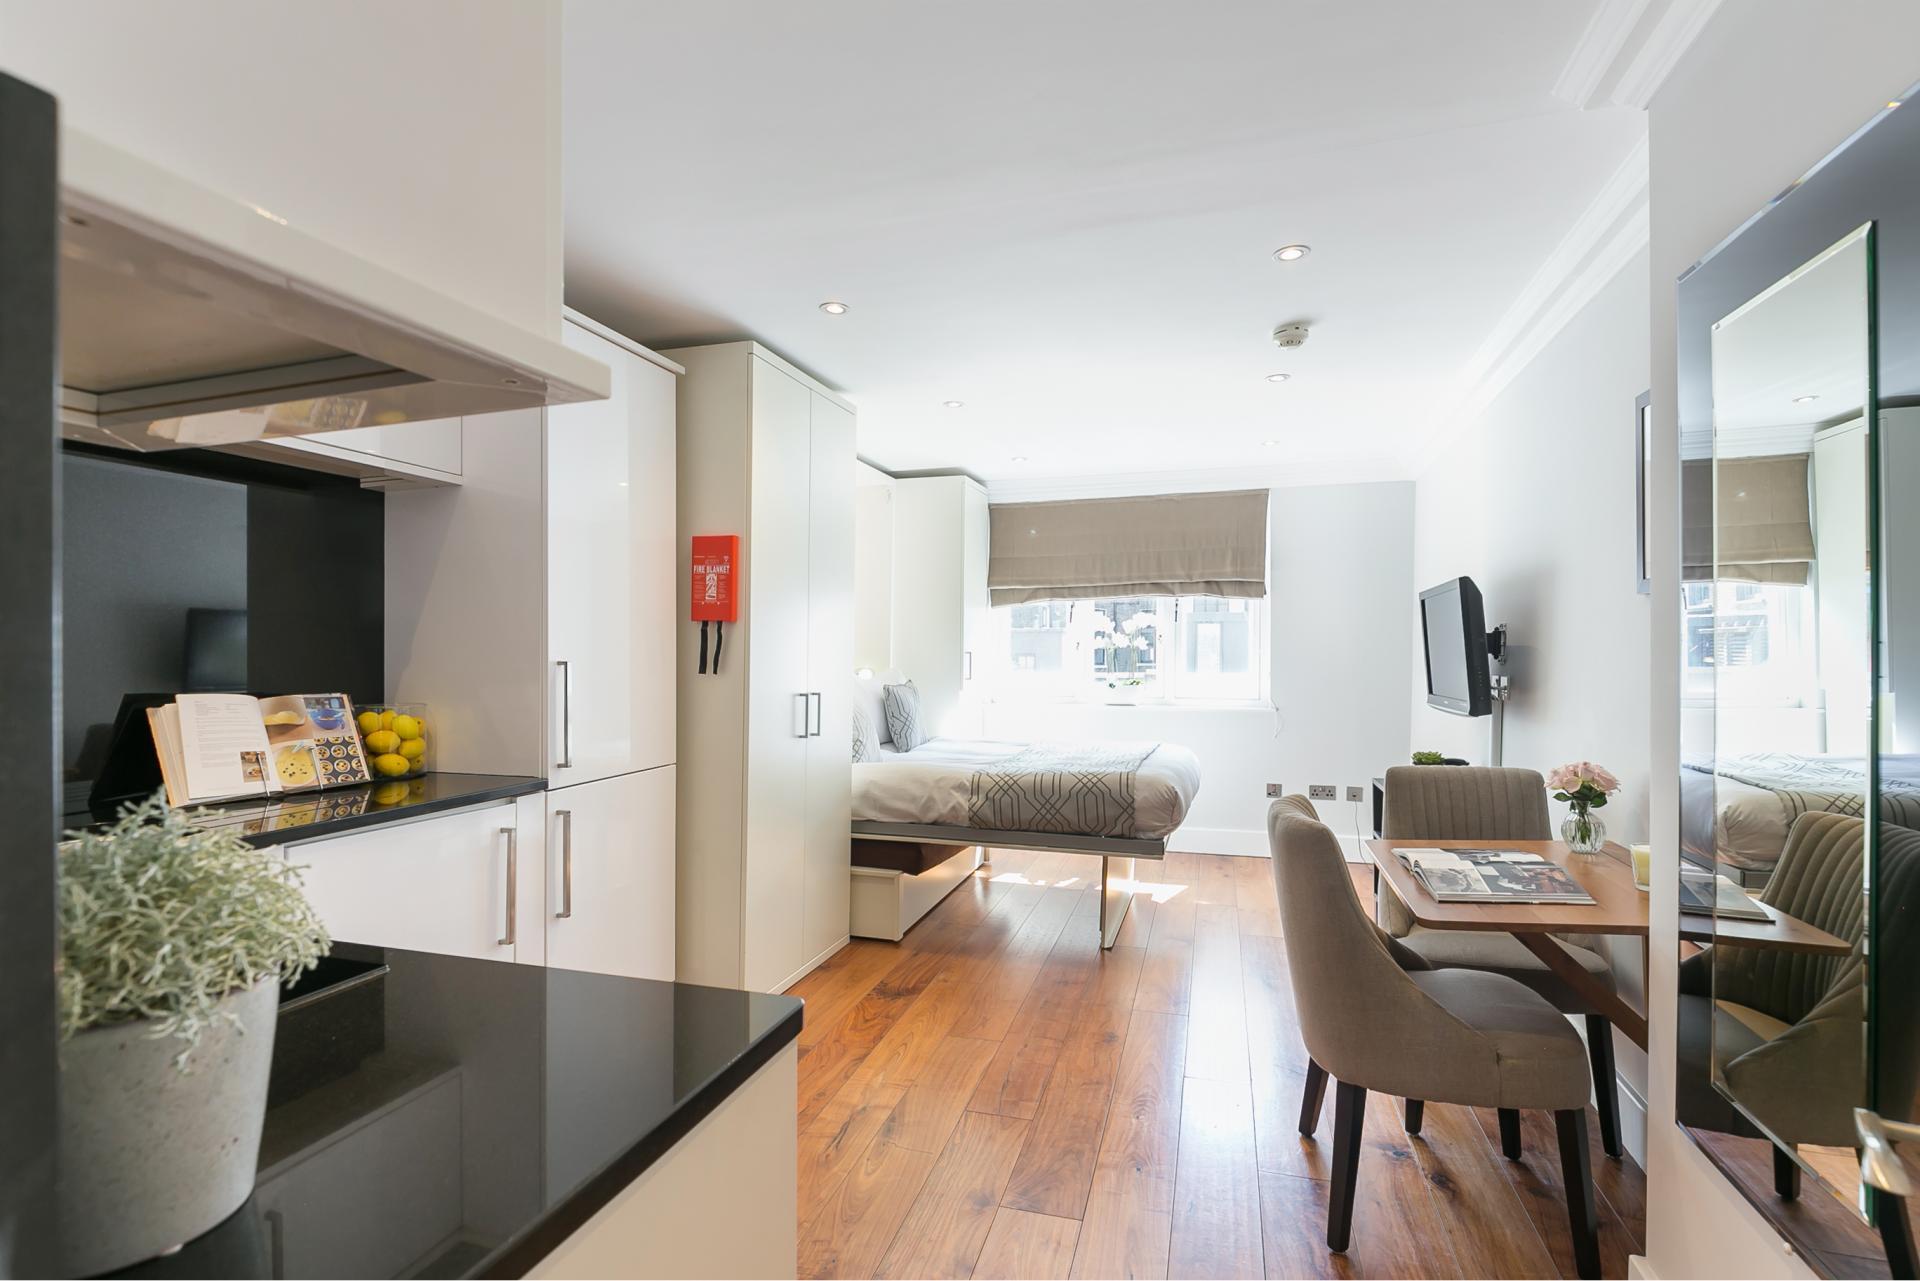 Studio overview at Chilworth Court Serviced Apartments, Paddington, London